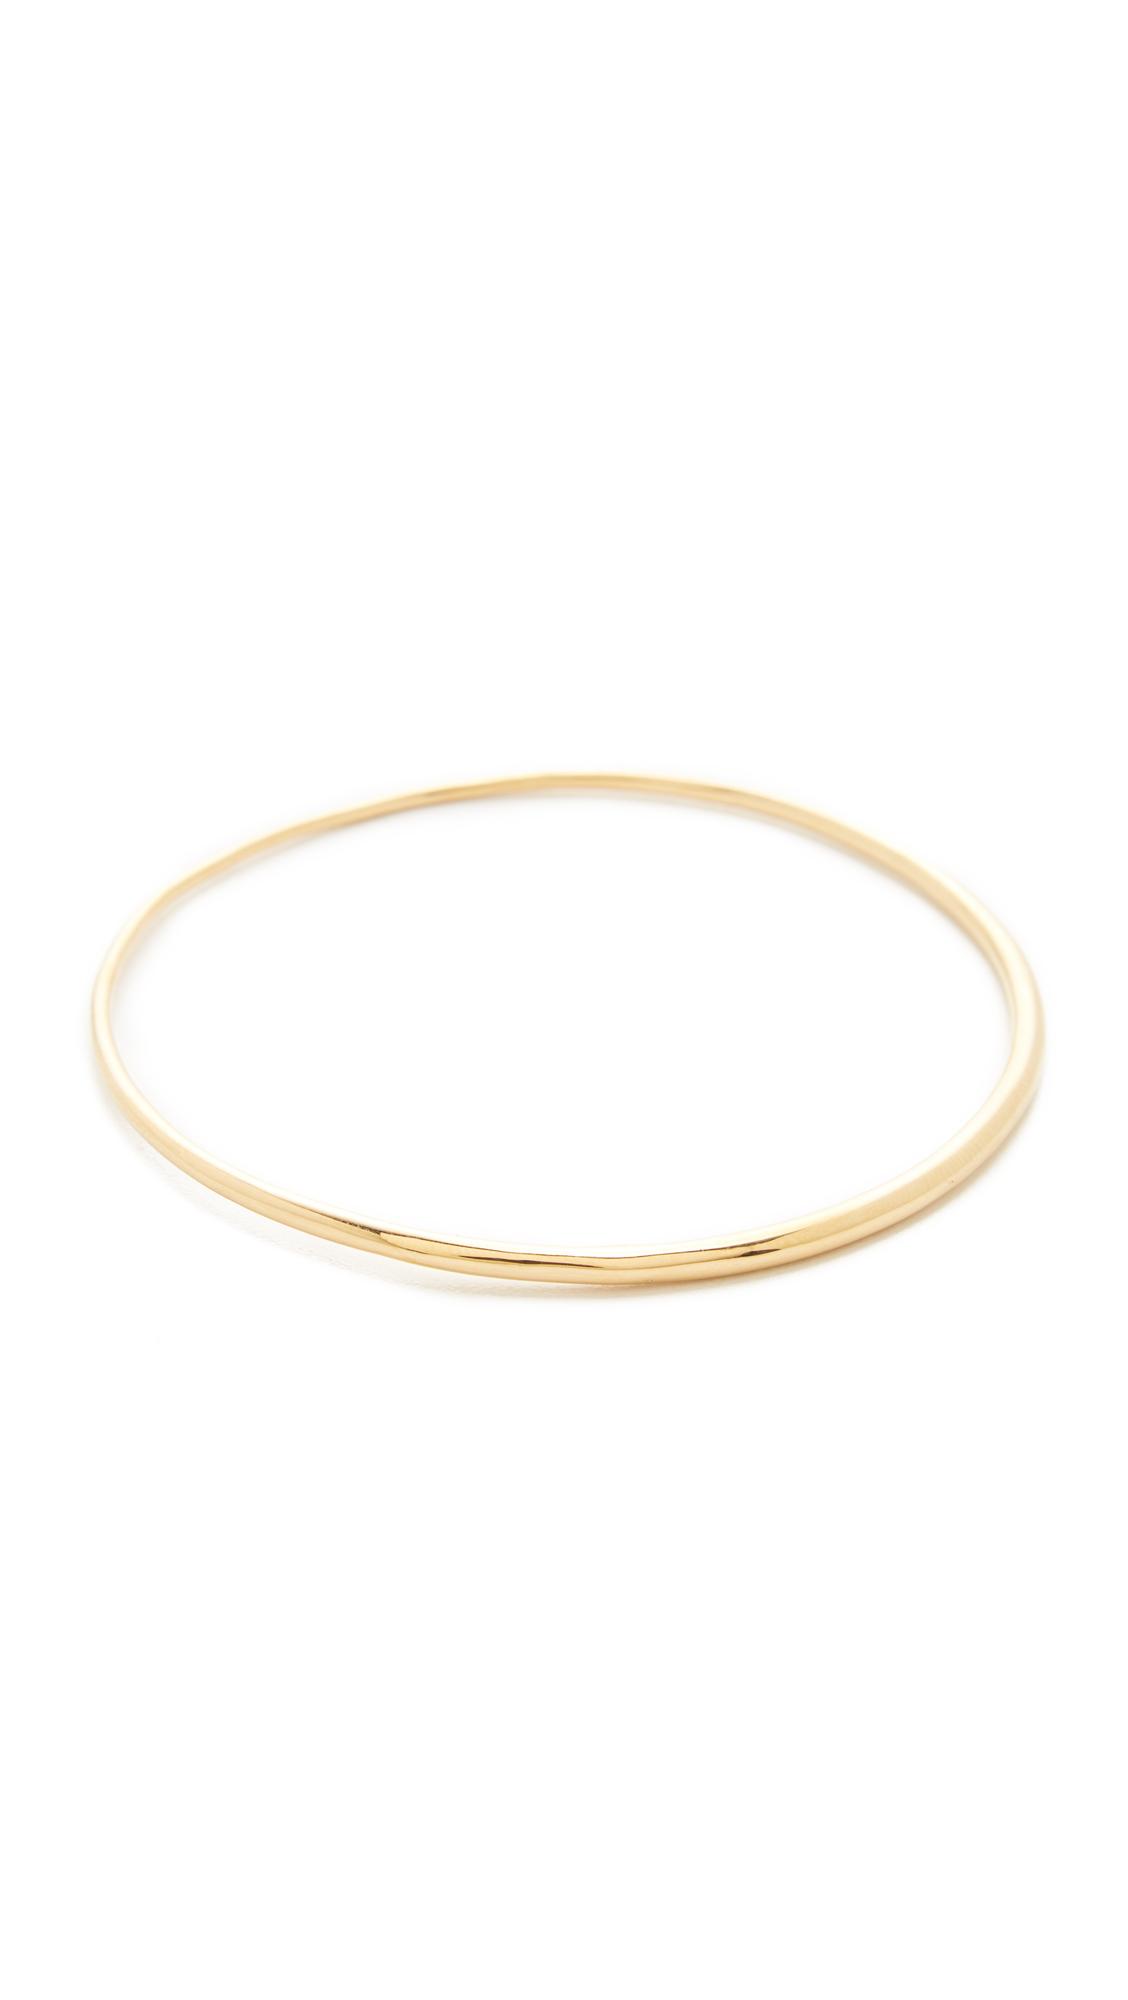 Gabriela Artigas Thin Eternal Bracelet